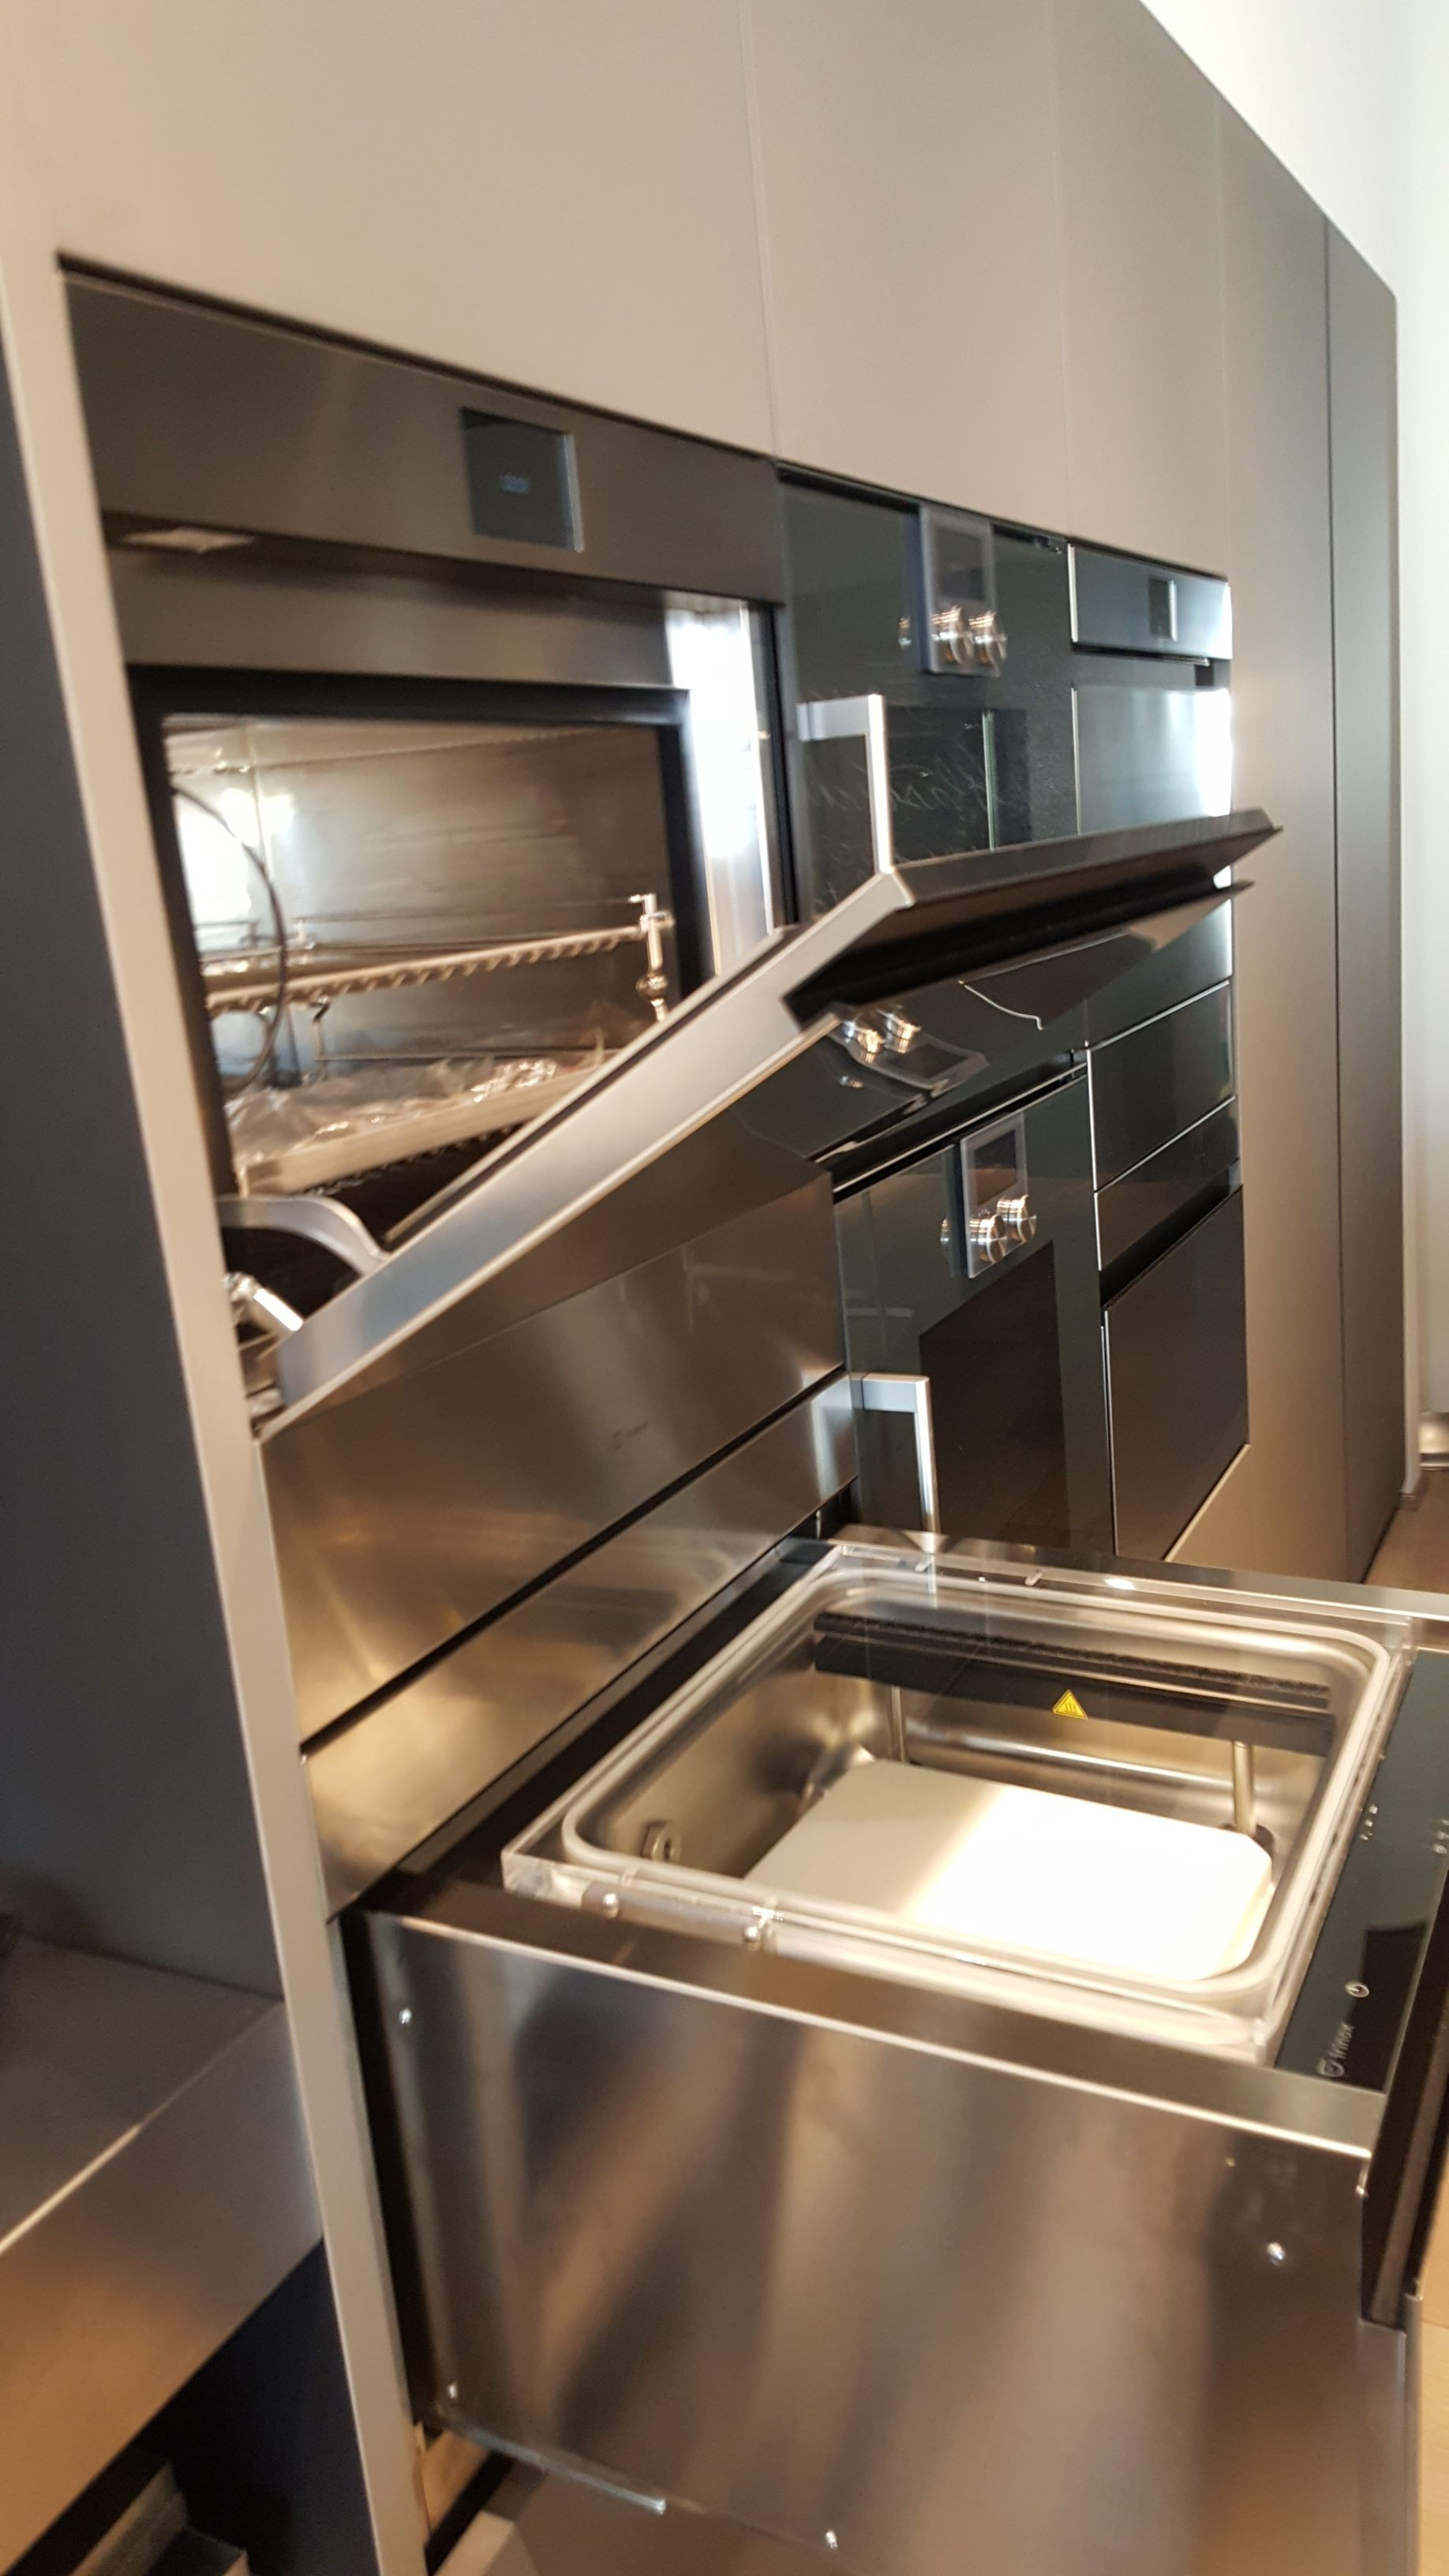 Fresco Blast Freezer/Chiller and Vacuum Sealer for the